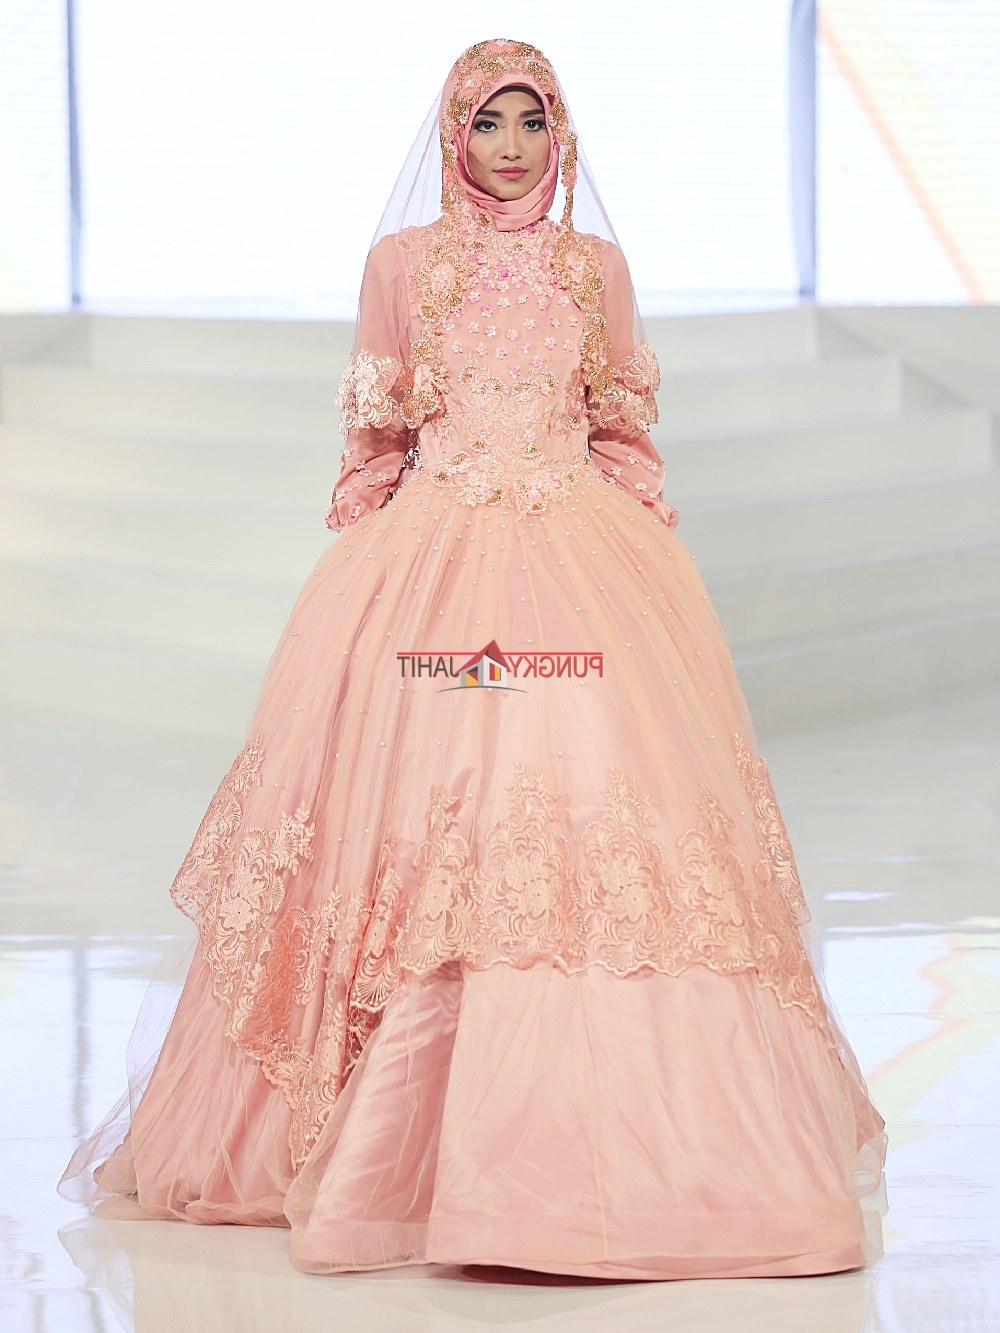 Bentuk Harga Sewa Gaun Pengantin Muslimah J7do Gaun Pengantin Muslimah Dress Muslim Pungky Rumah Jahit